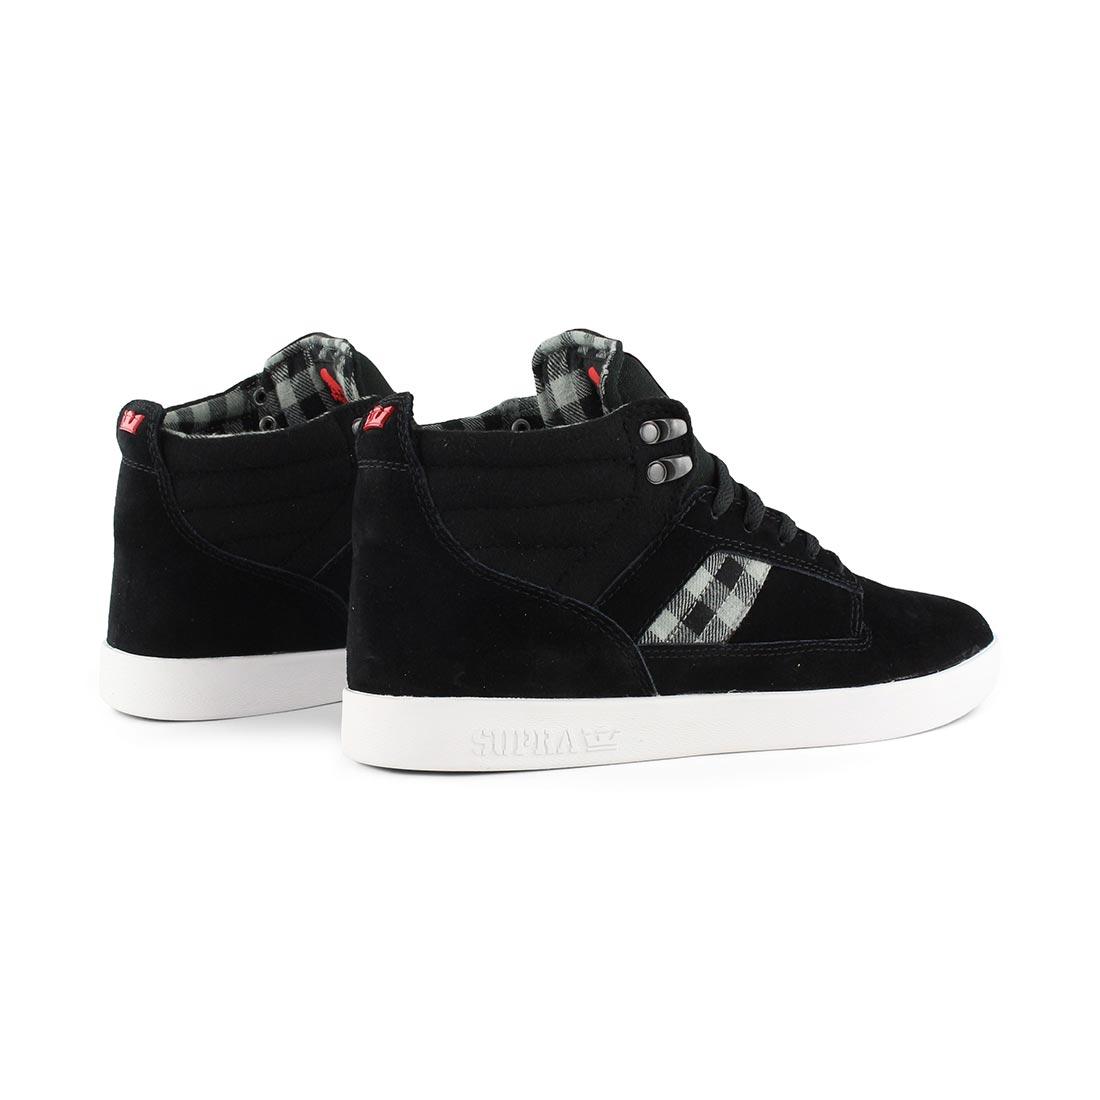 255c6783097a ... Supra-Bandit-Shoes-Black-Plaid-White- ...